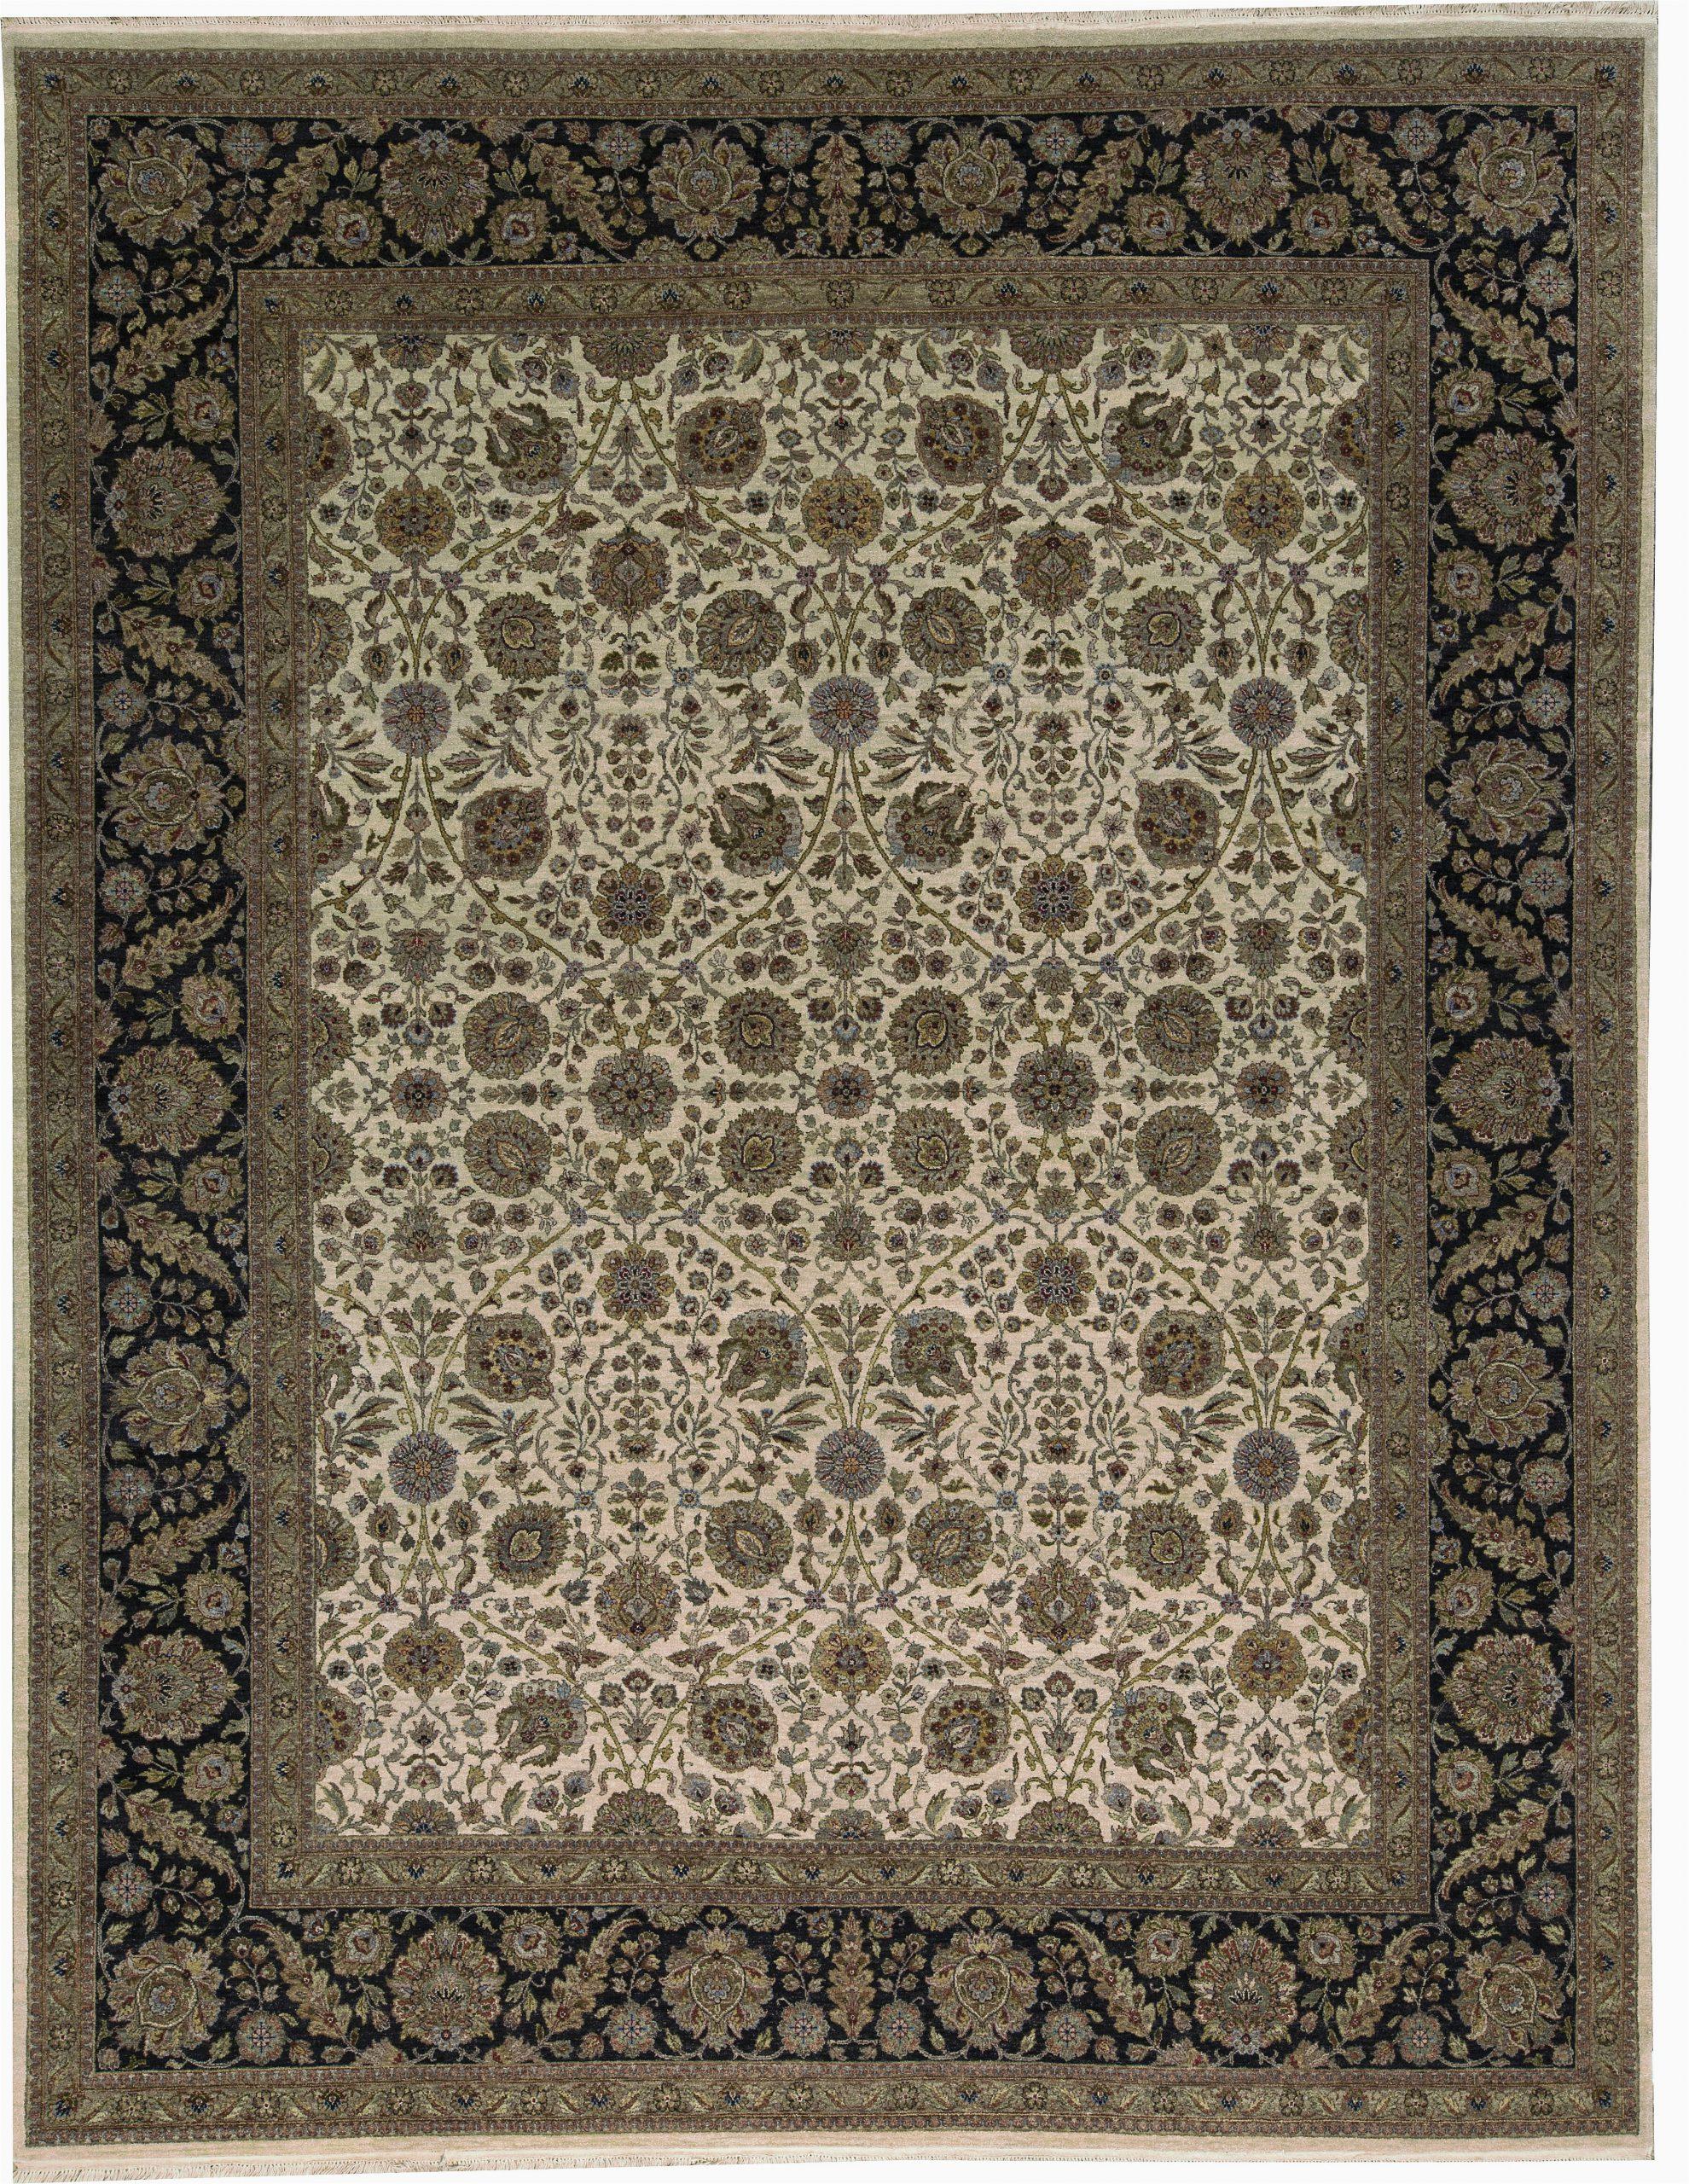 bokara rug co inc one of a kind mountain king handwoven 1111 x 155 wool brown area rug abhd2346